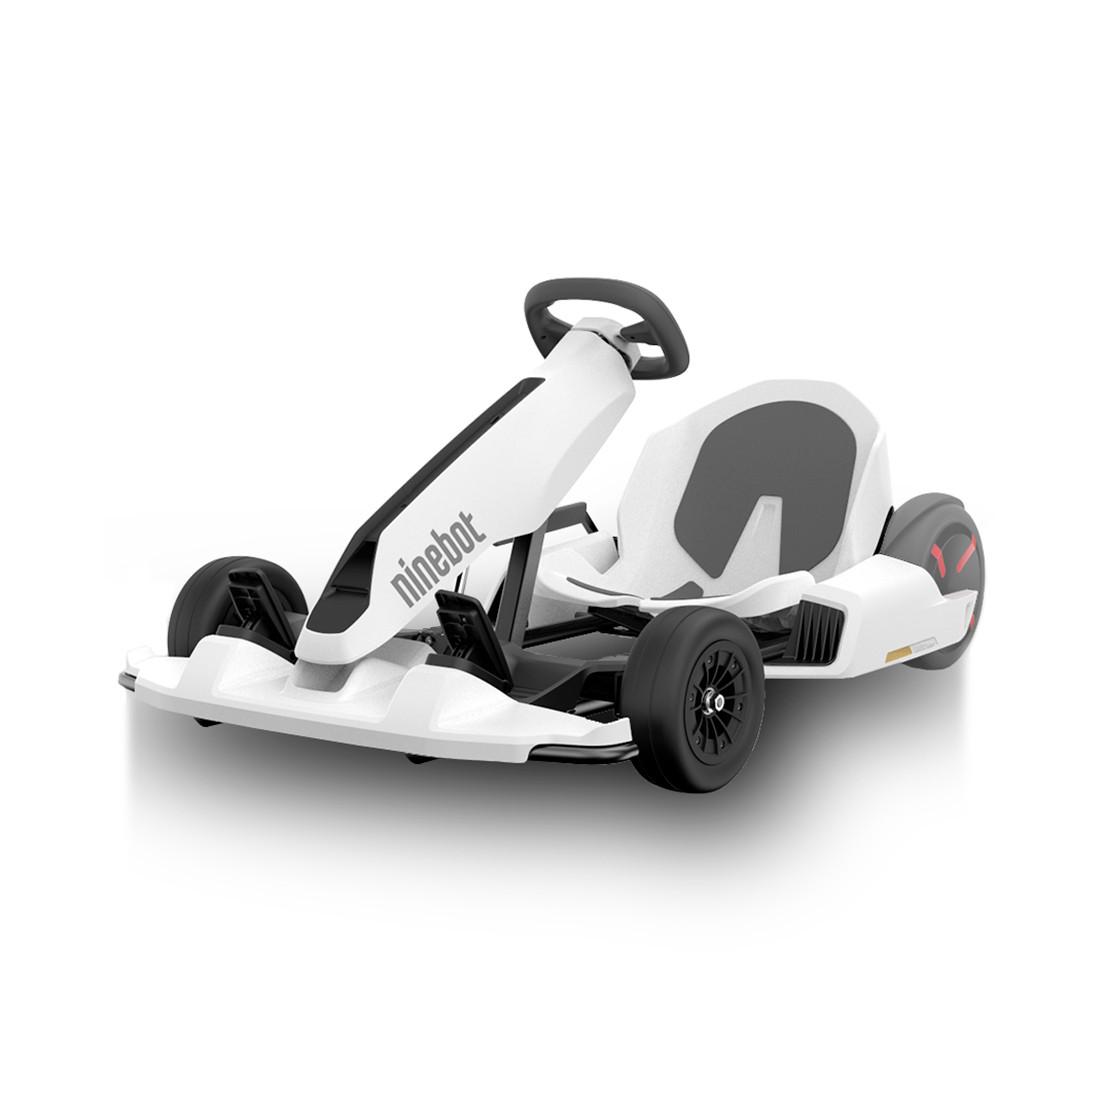 Набор для картинга Ninebot Segway Gokart Kit Белый - фото 3